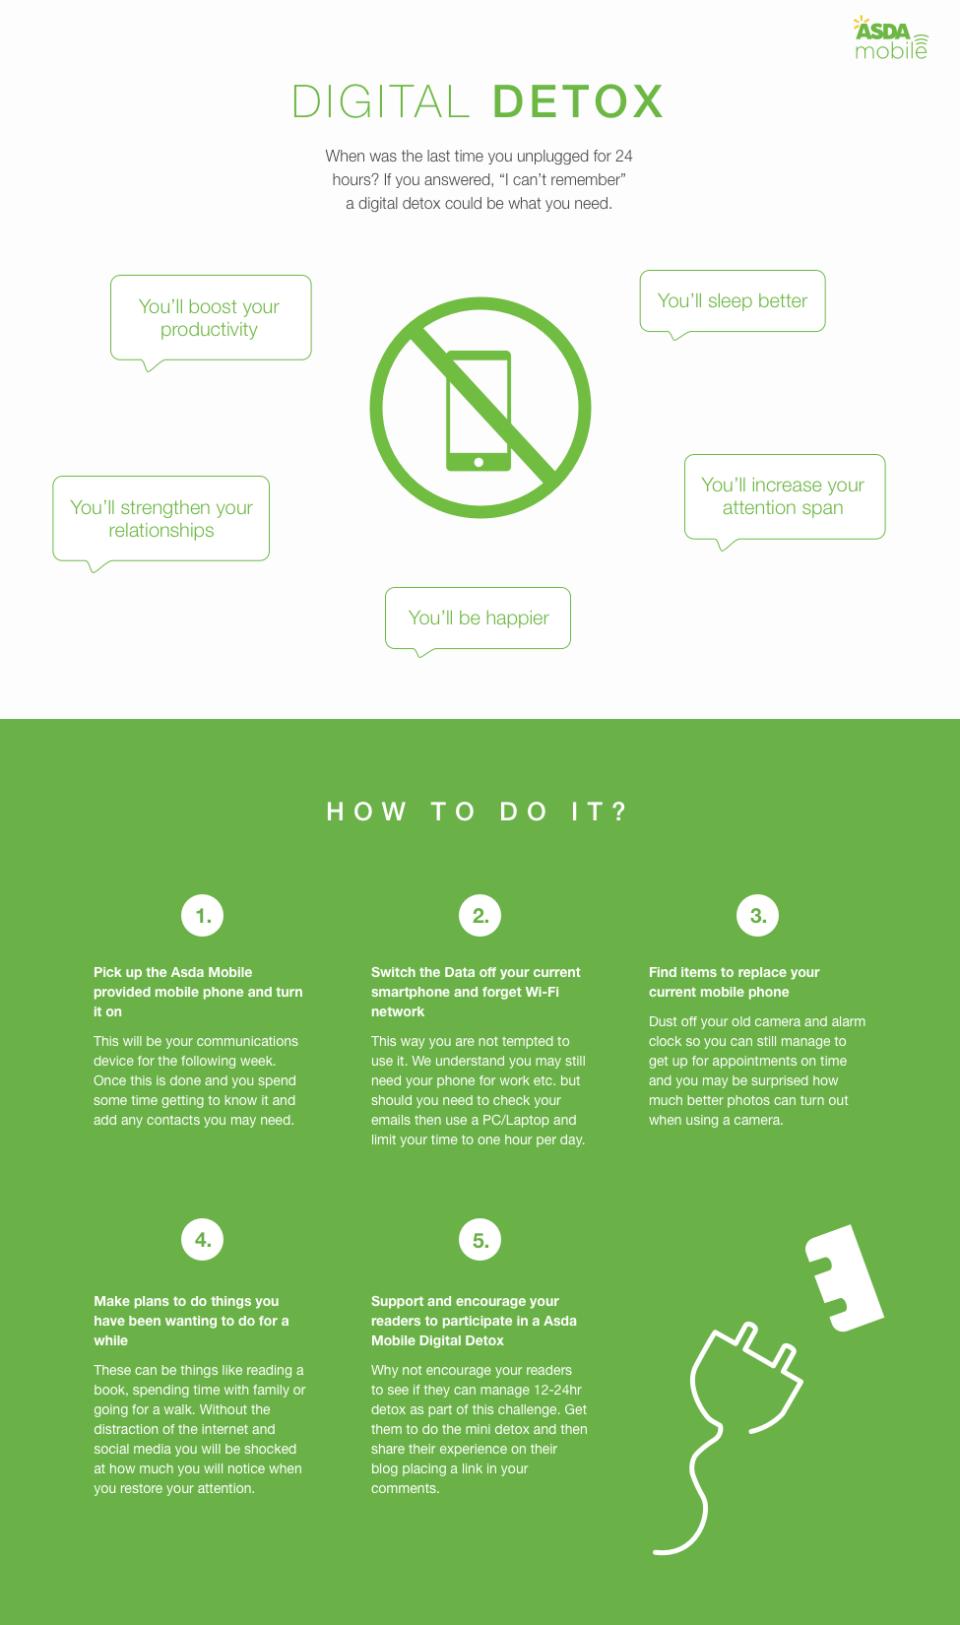 Digital Detox Infographic